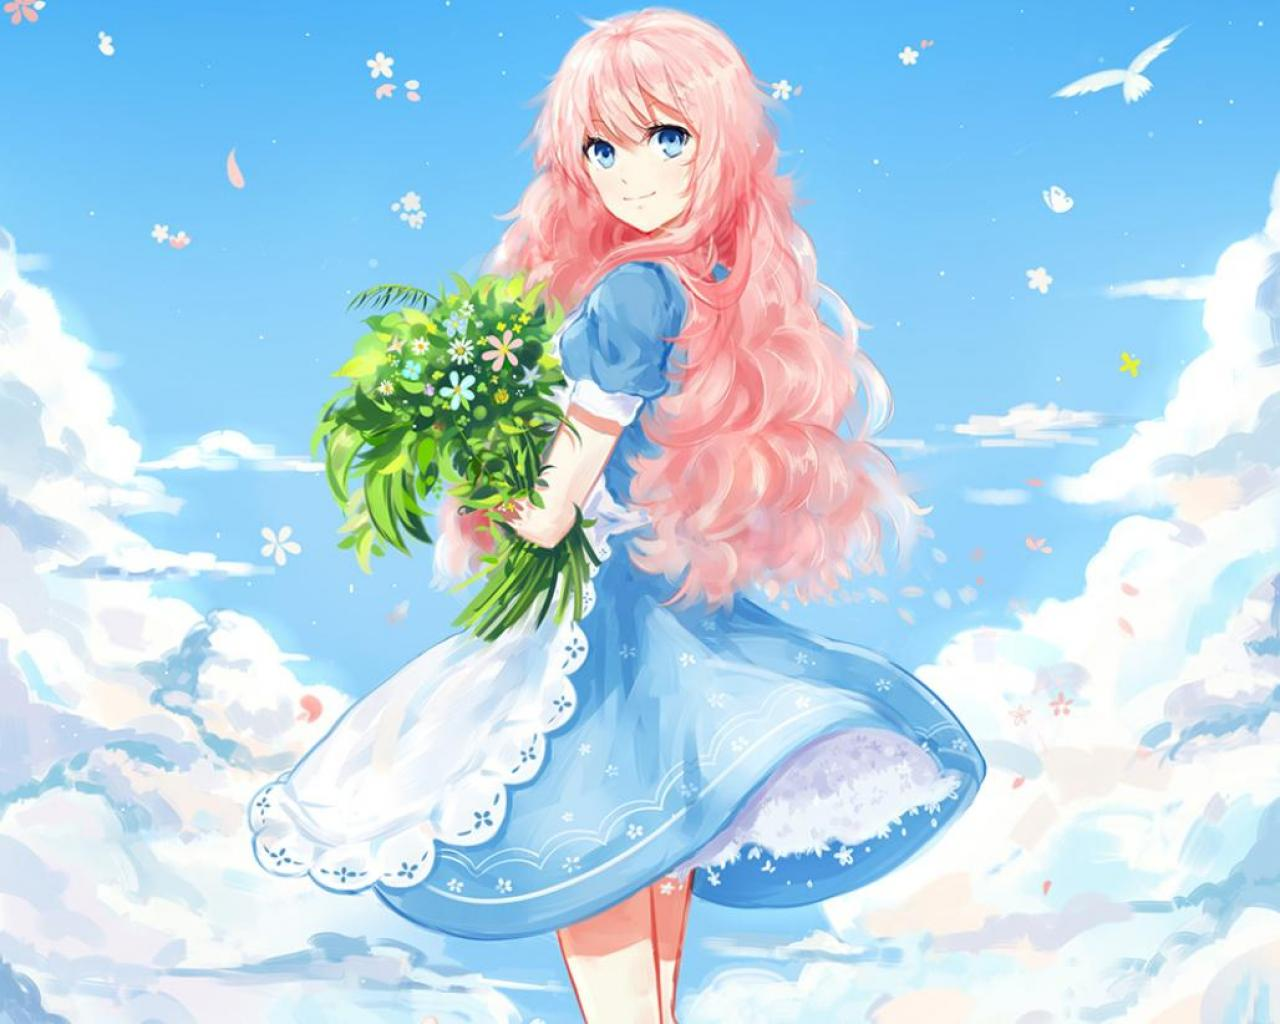 Beauty Dress Girl Anime